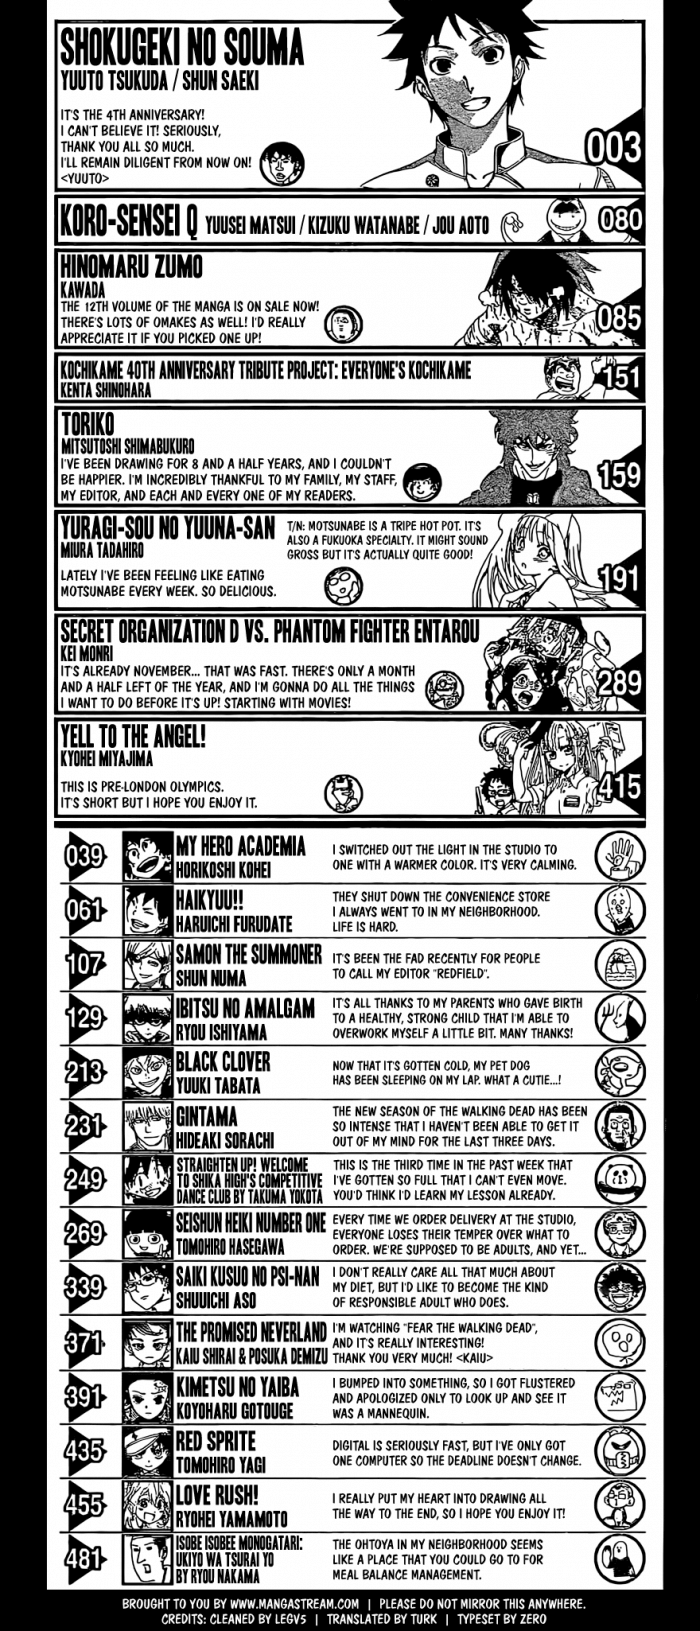 shonen-jump-volume-50-comentarios-mangakas